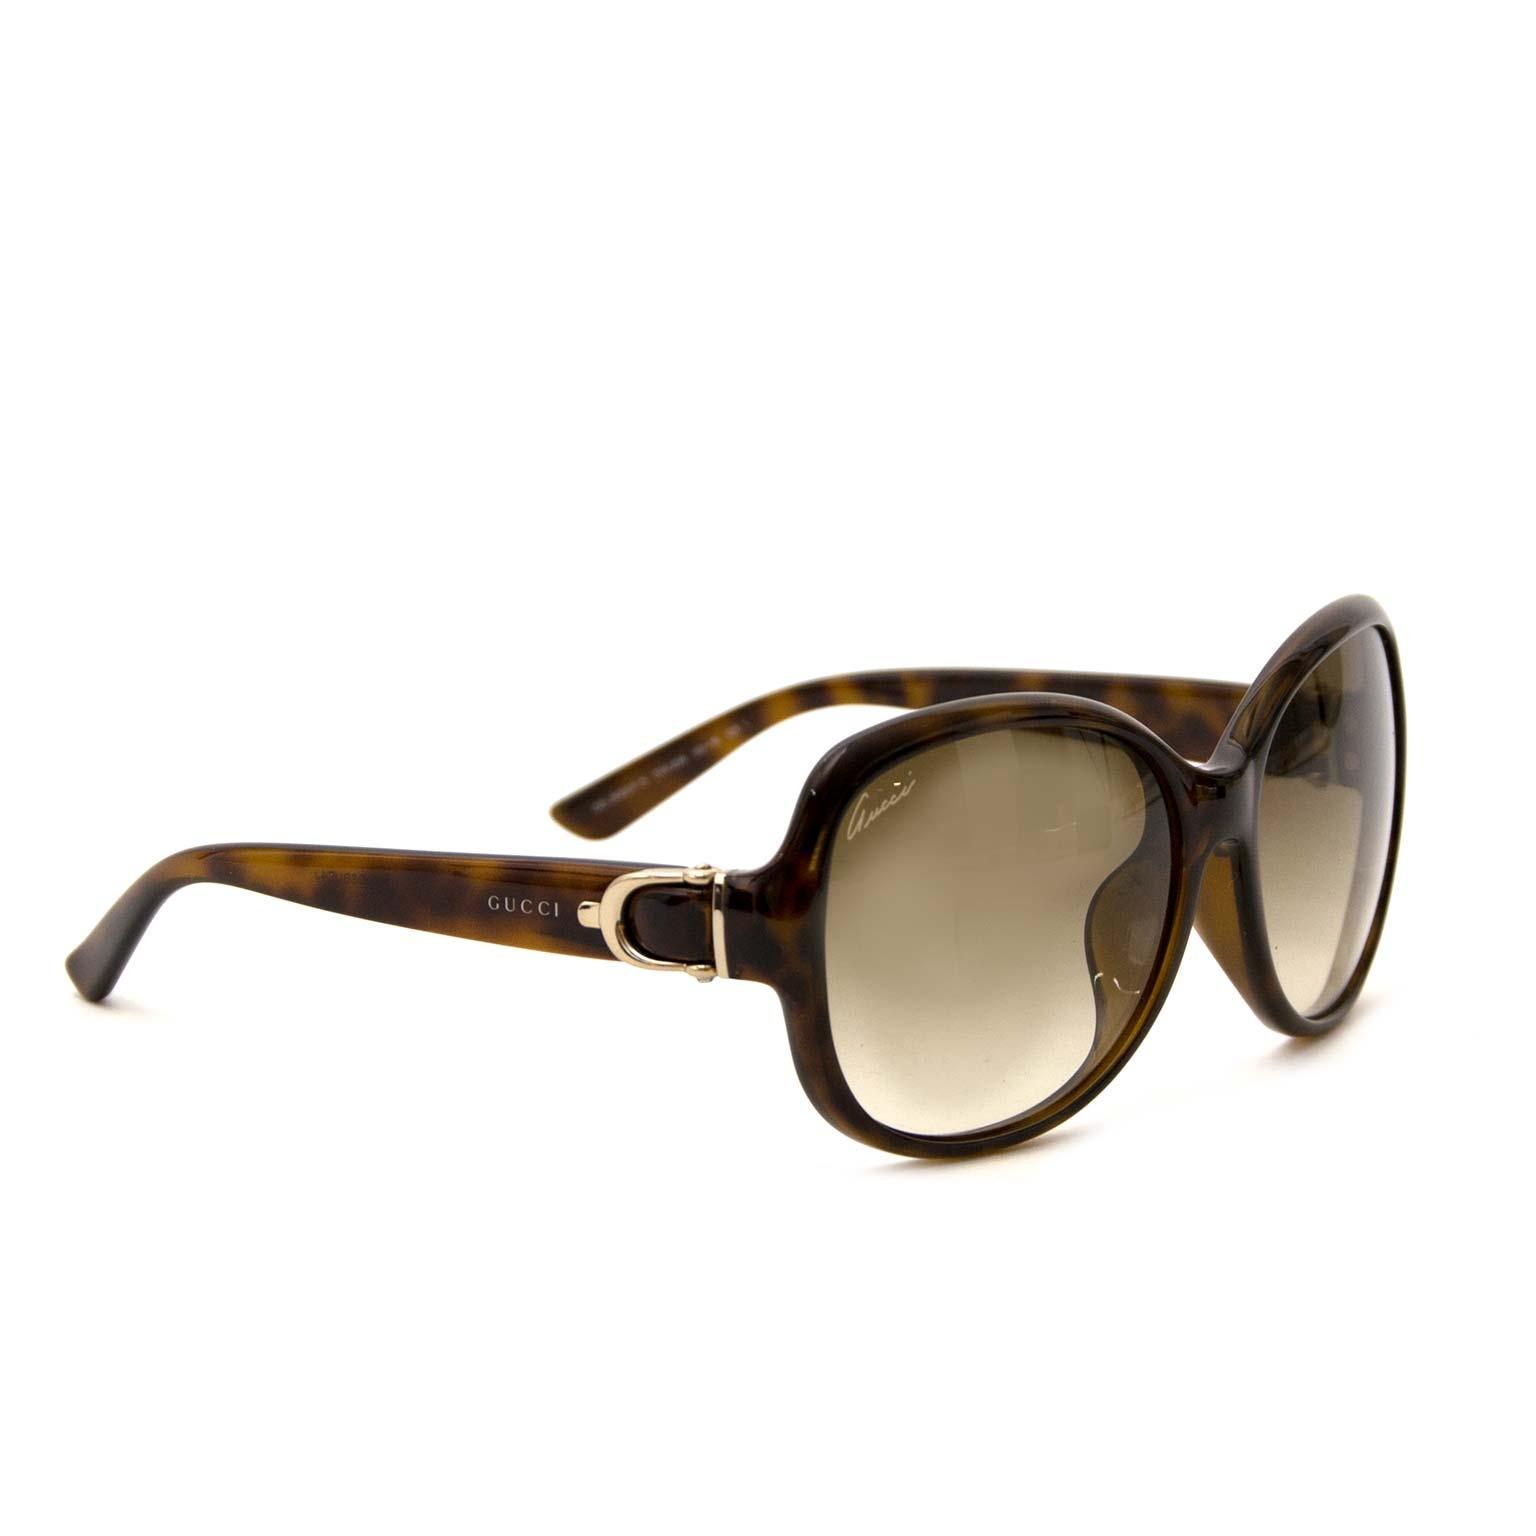 b3ff86e22134 Koop tweedehands Gucci zonnebril bij Buy secondhand Gucci sunglasses at  Labellov. Safe online shopping. Koop tweedehands Gucci zonnebril bij